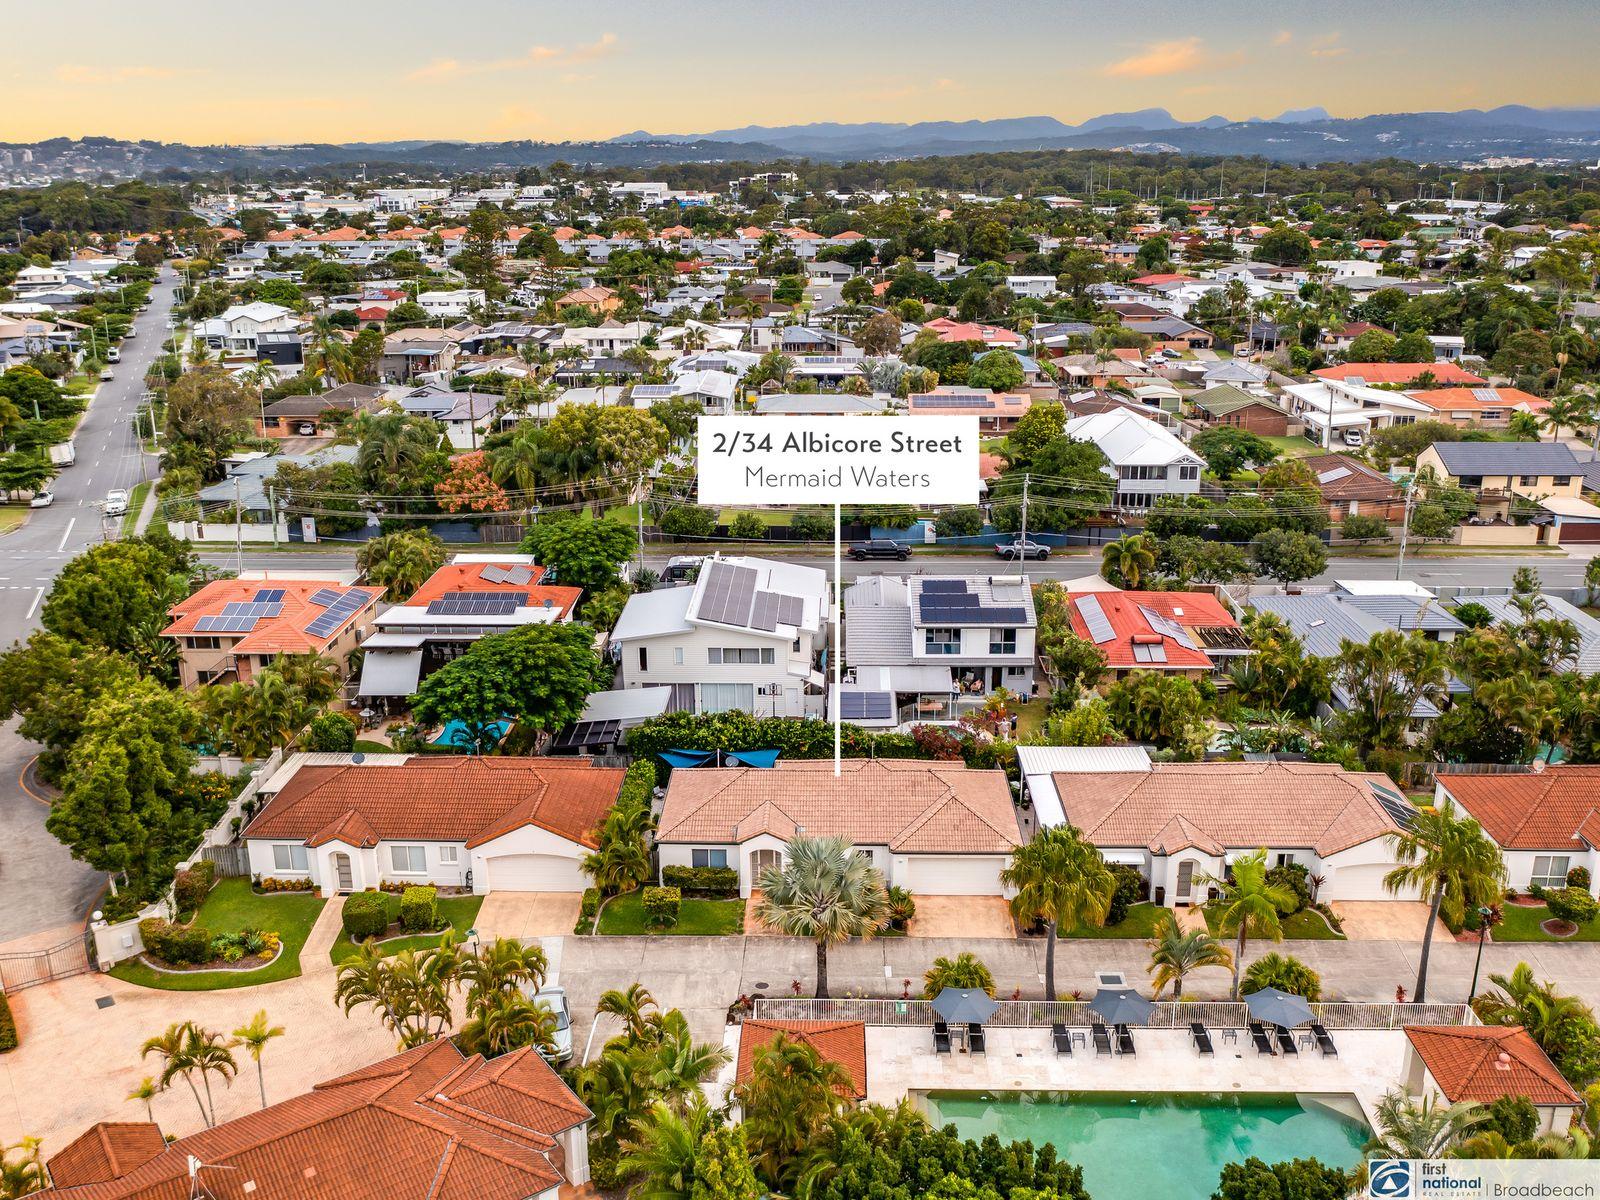 2/34 Albicore Street, Mermaid Waters, QLD 4218